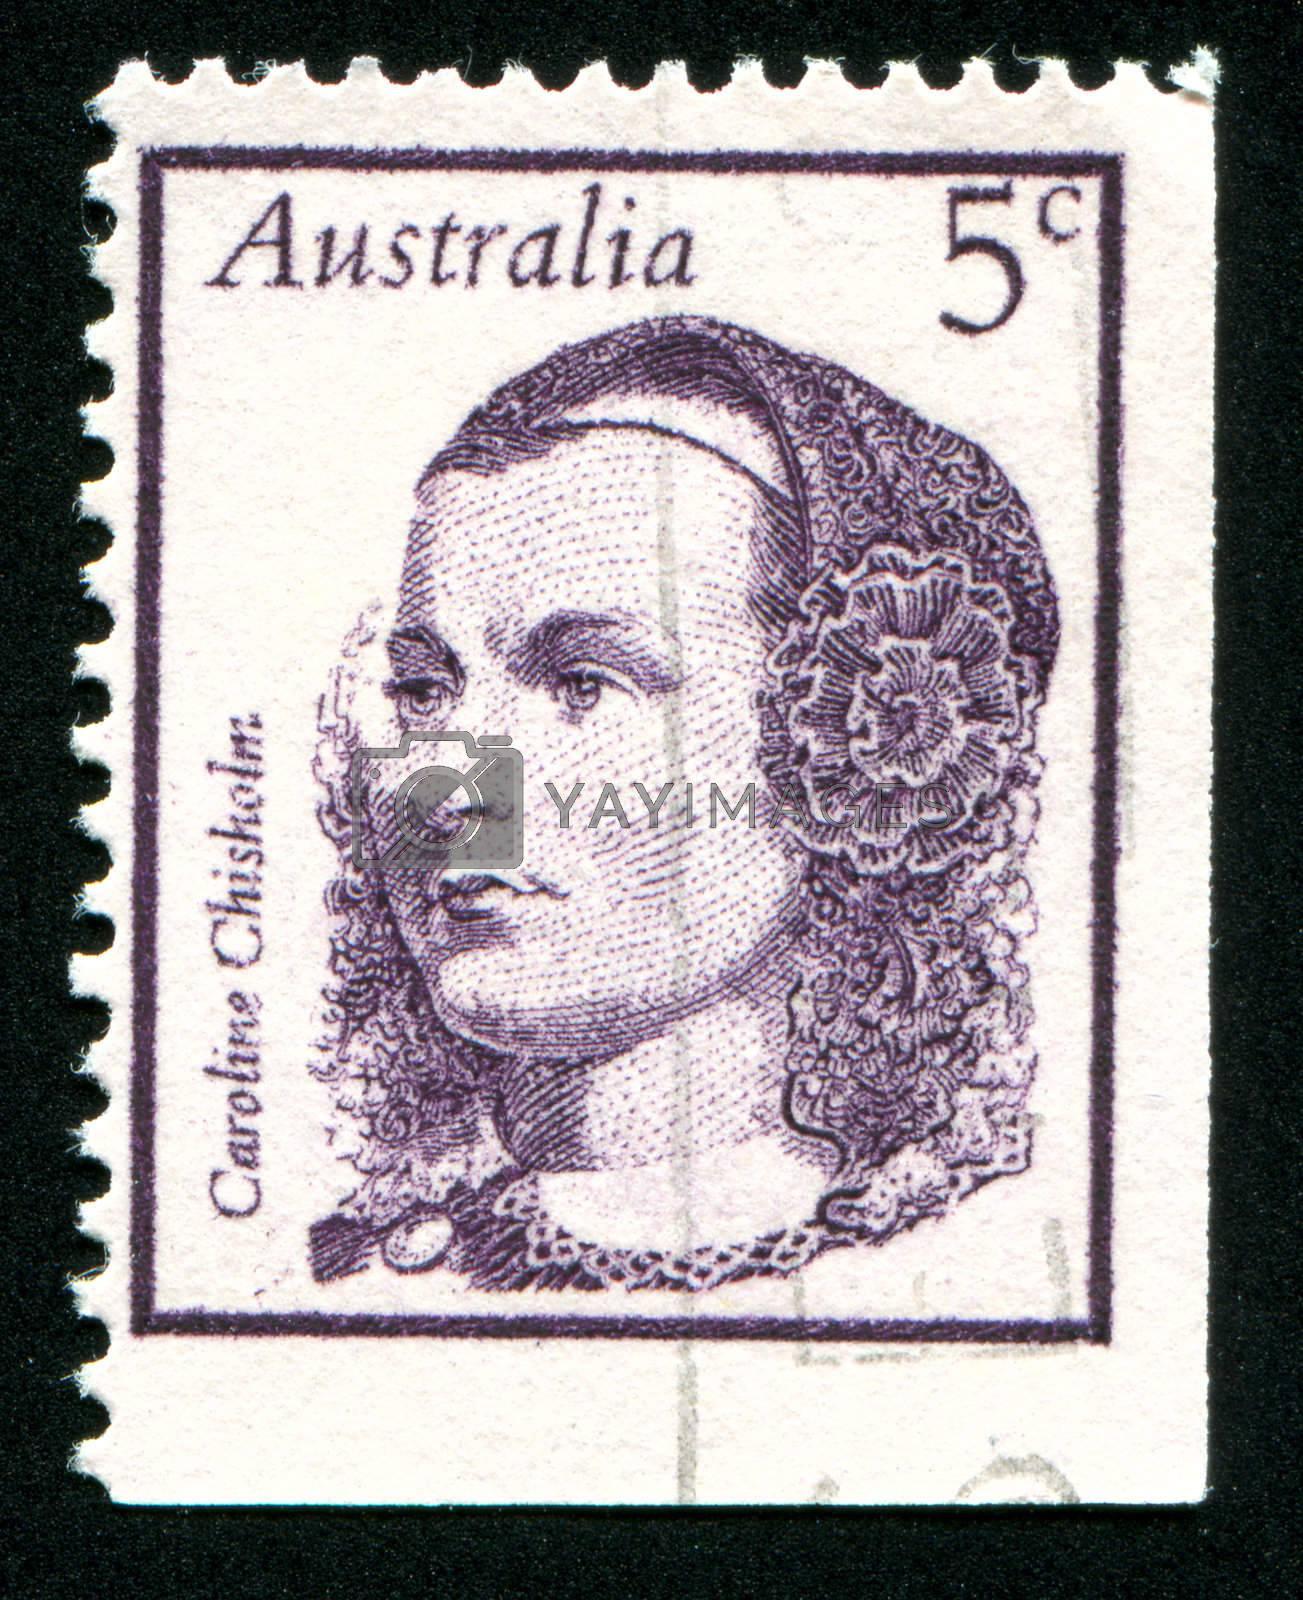 AUSTRALIA - CIRCA 1968: stamp printed by Australia, shows Caroline Chisholm, circa 1968